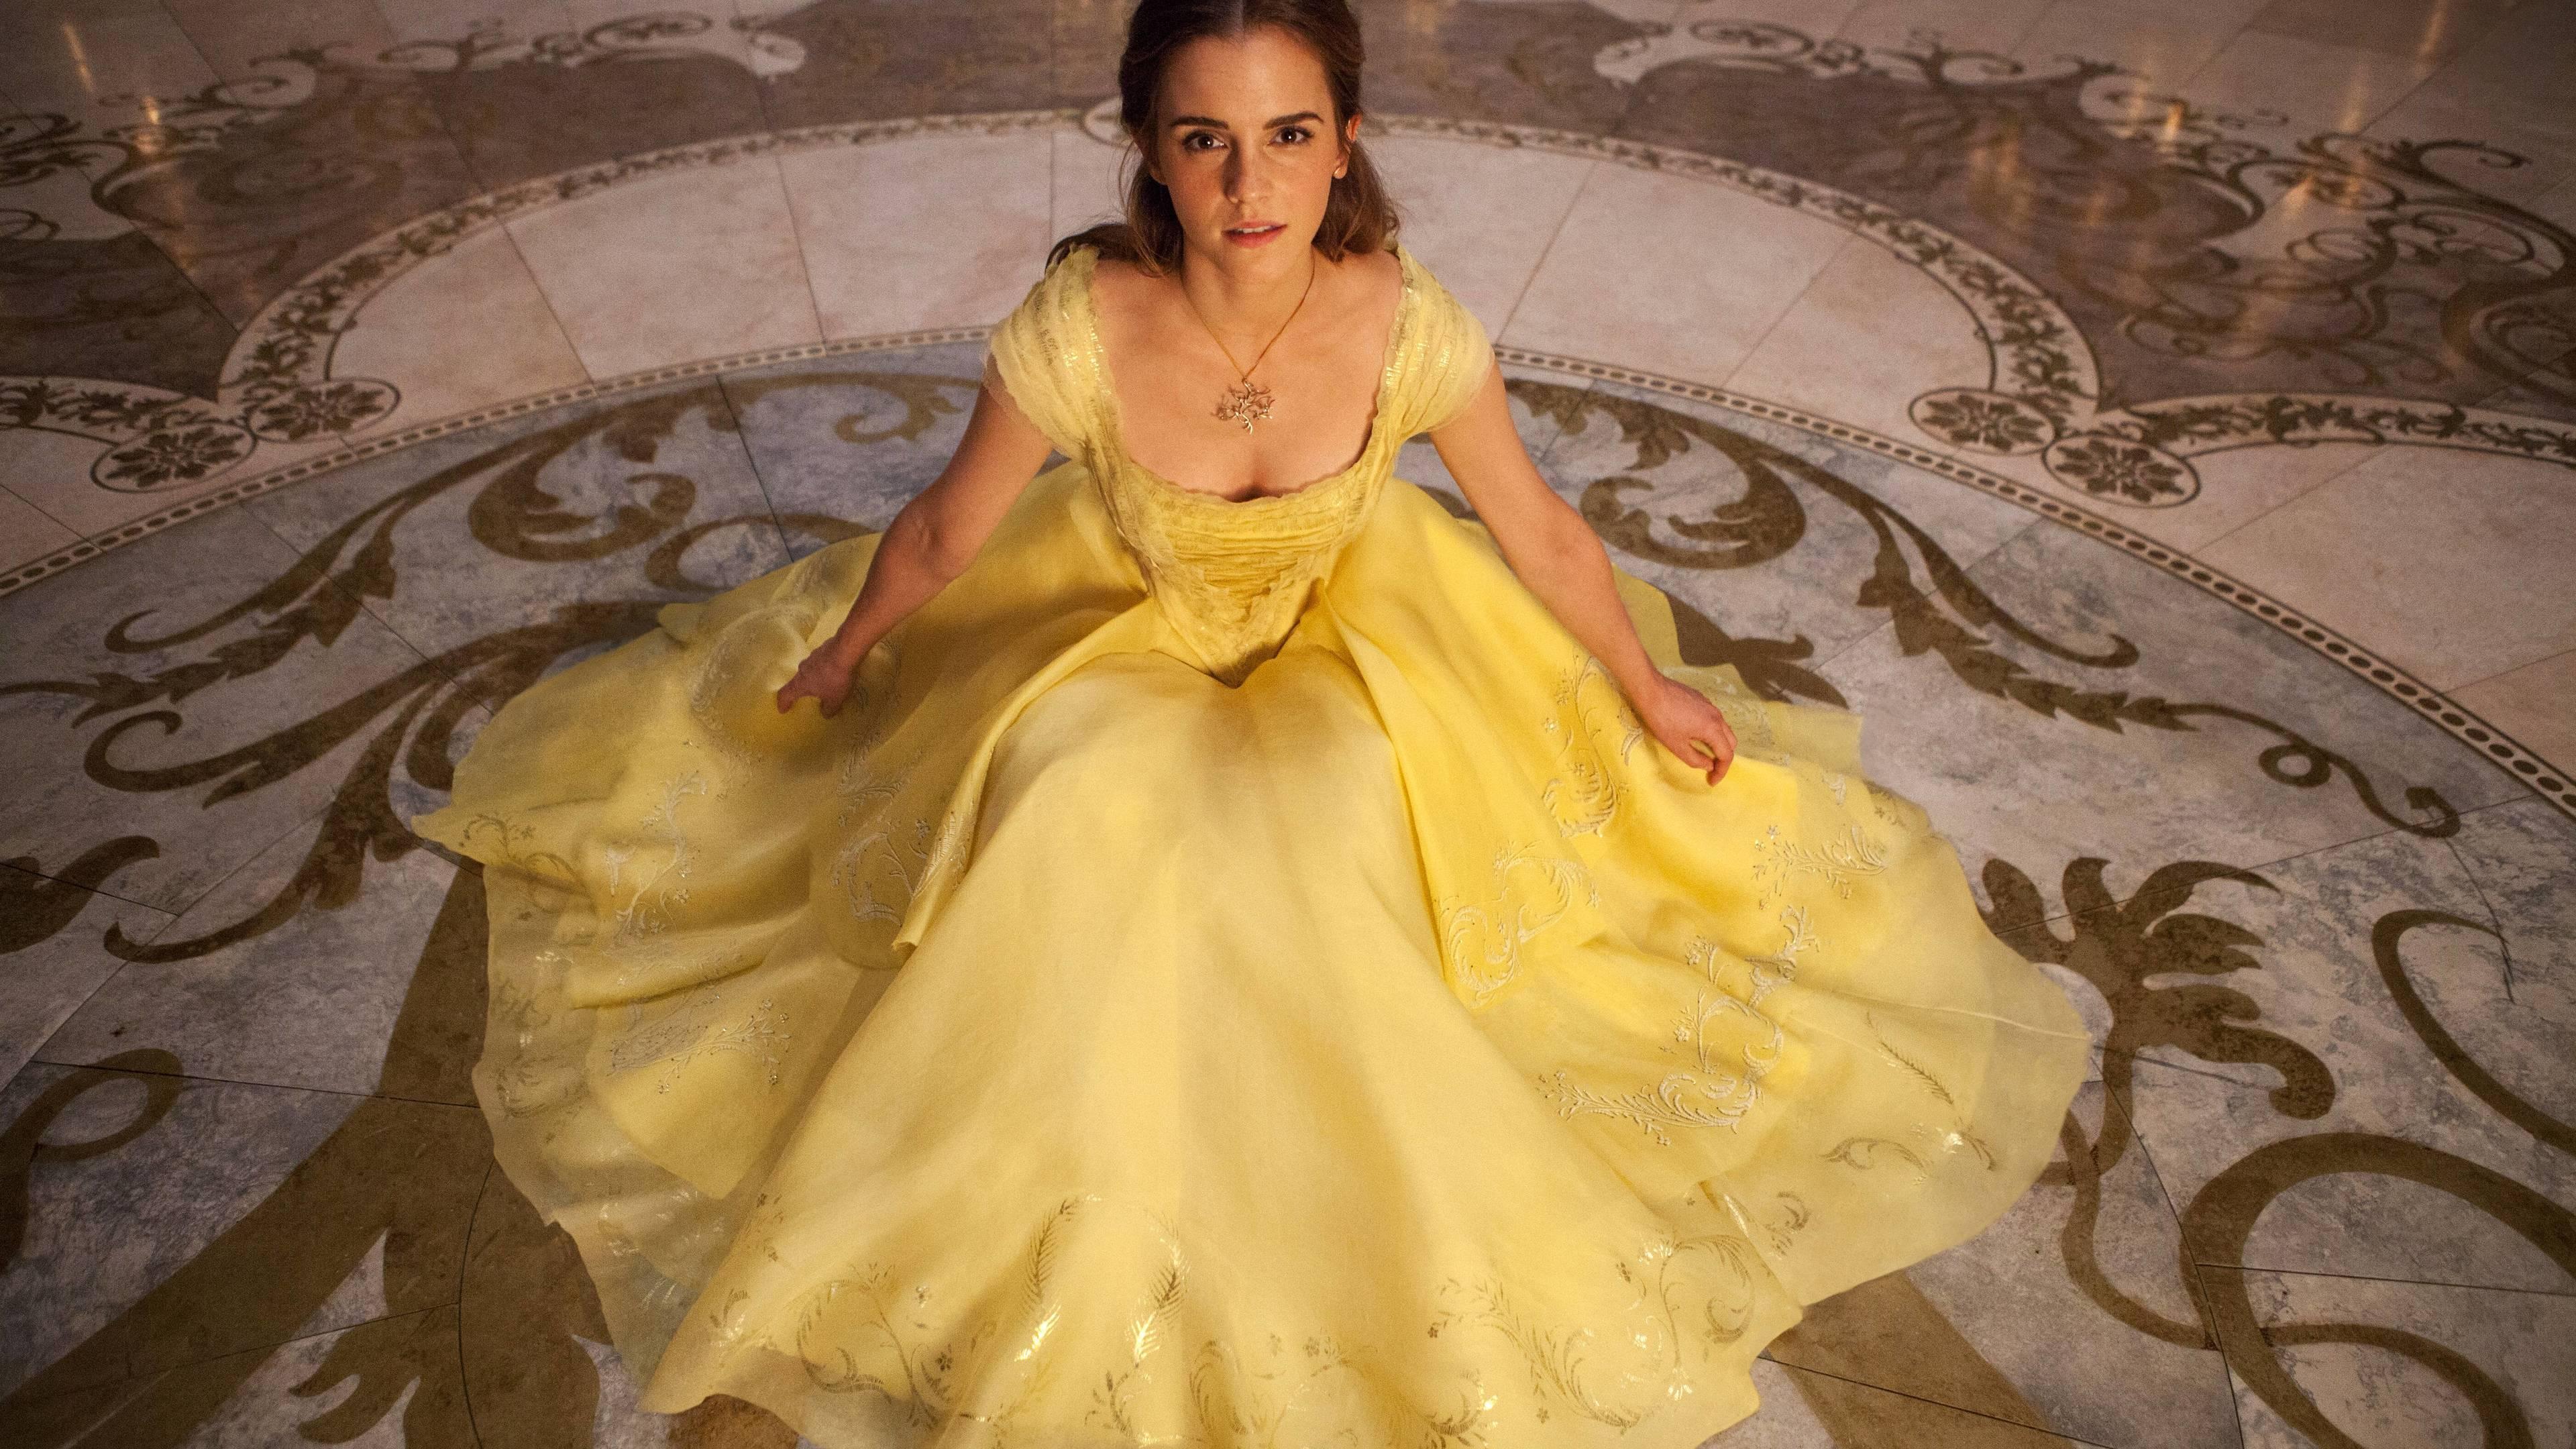 Wallpaper 4k Emma Watson In Beauty And The Beast 5k 2017 Movies